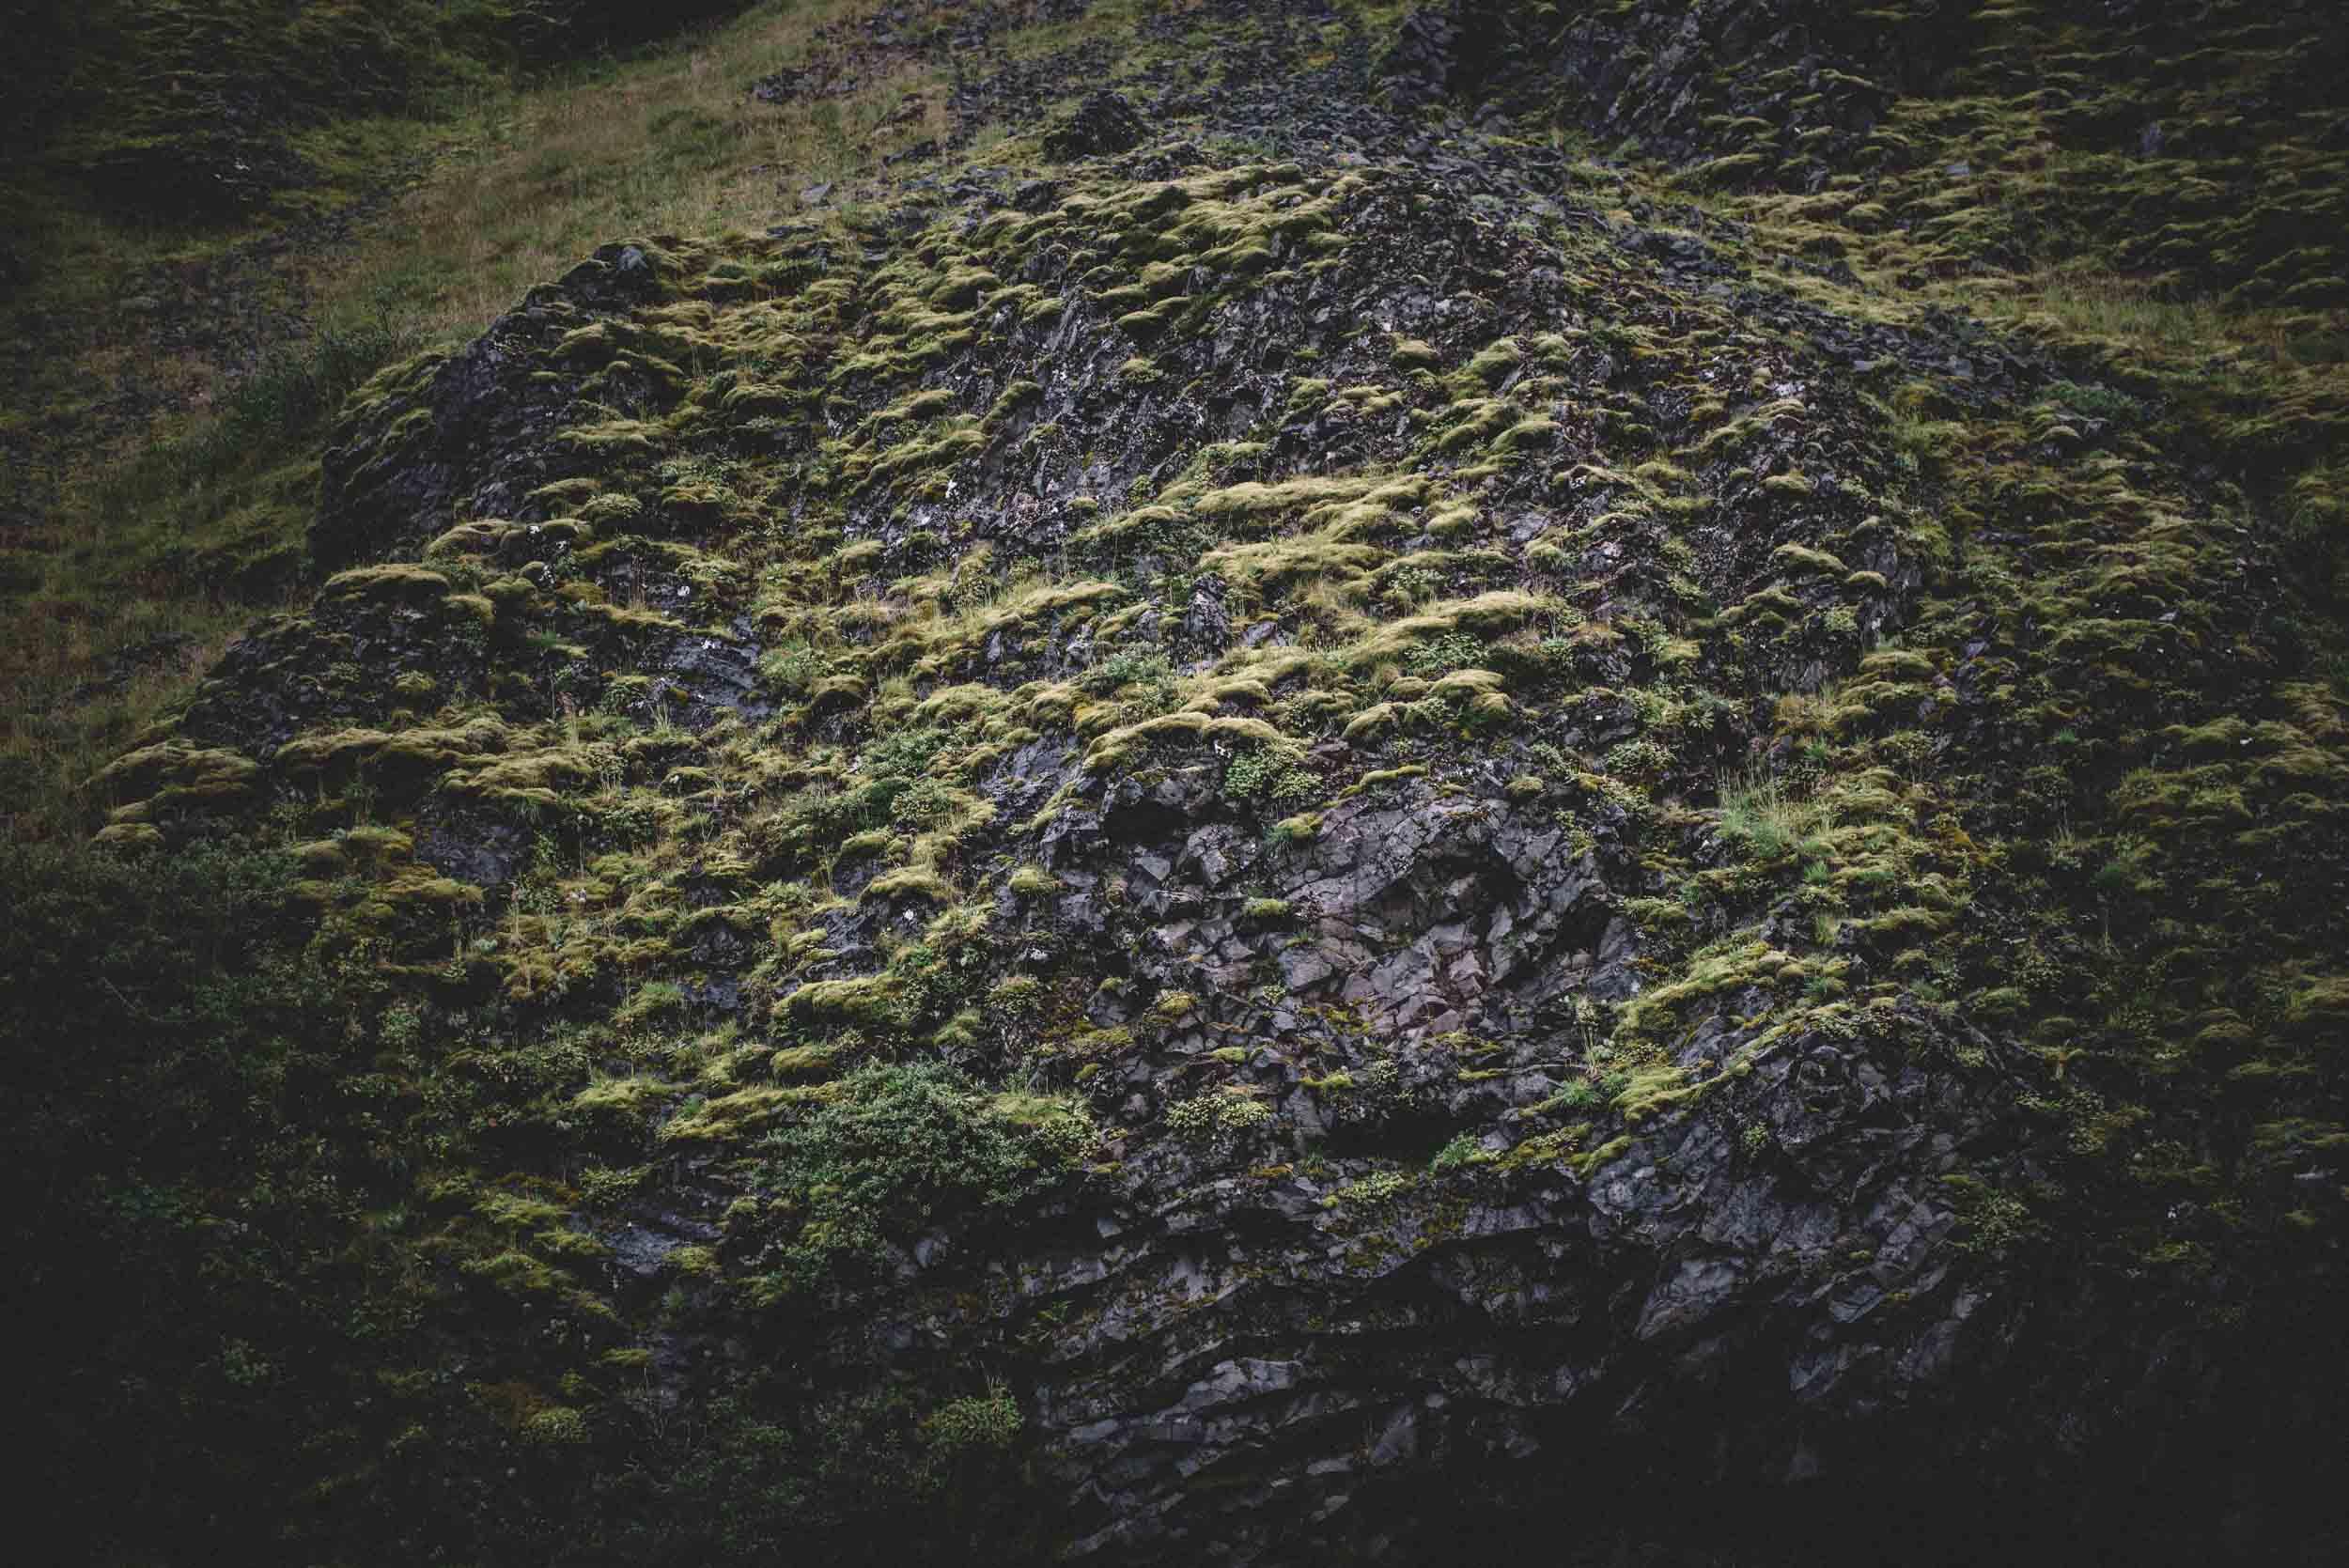 scouting-iceland-25.jpg